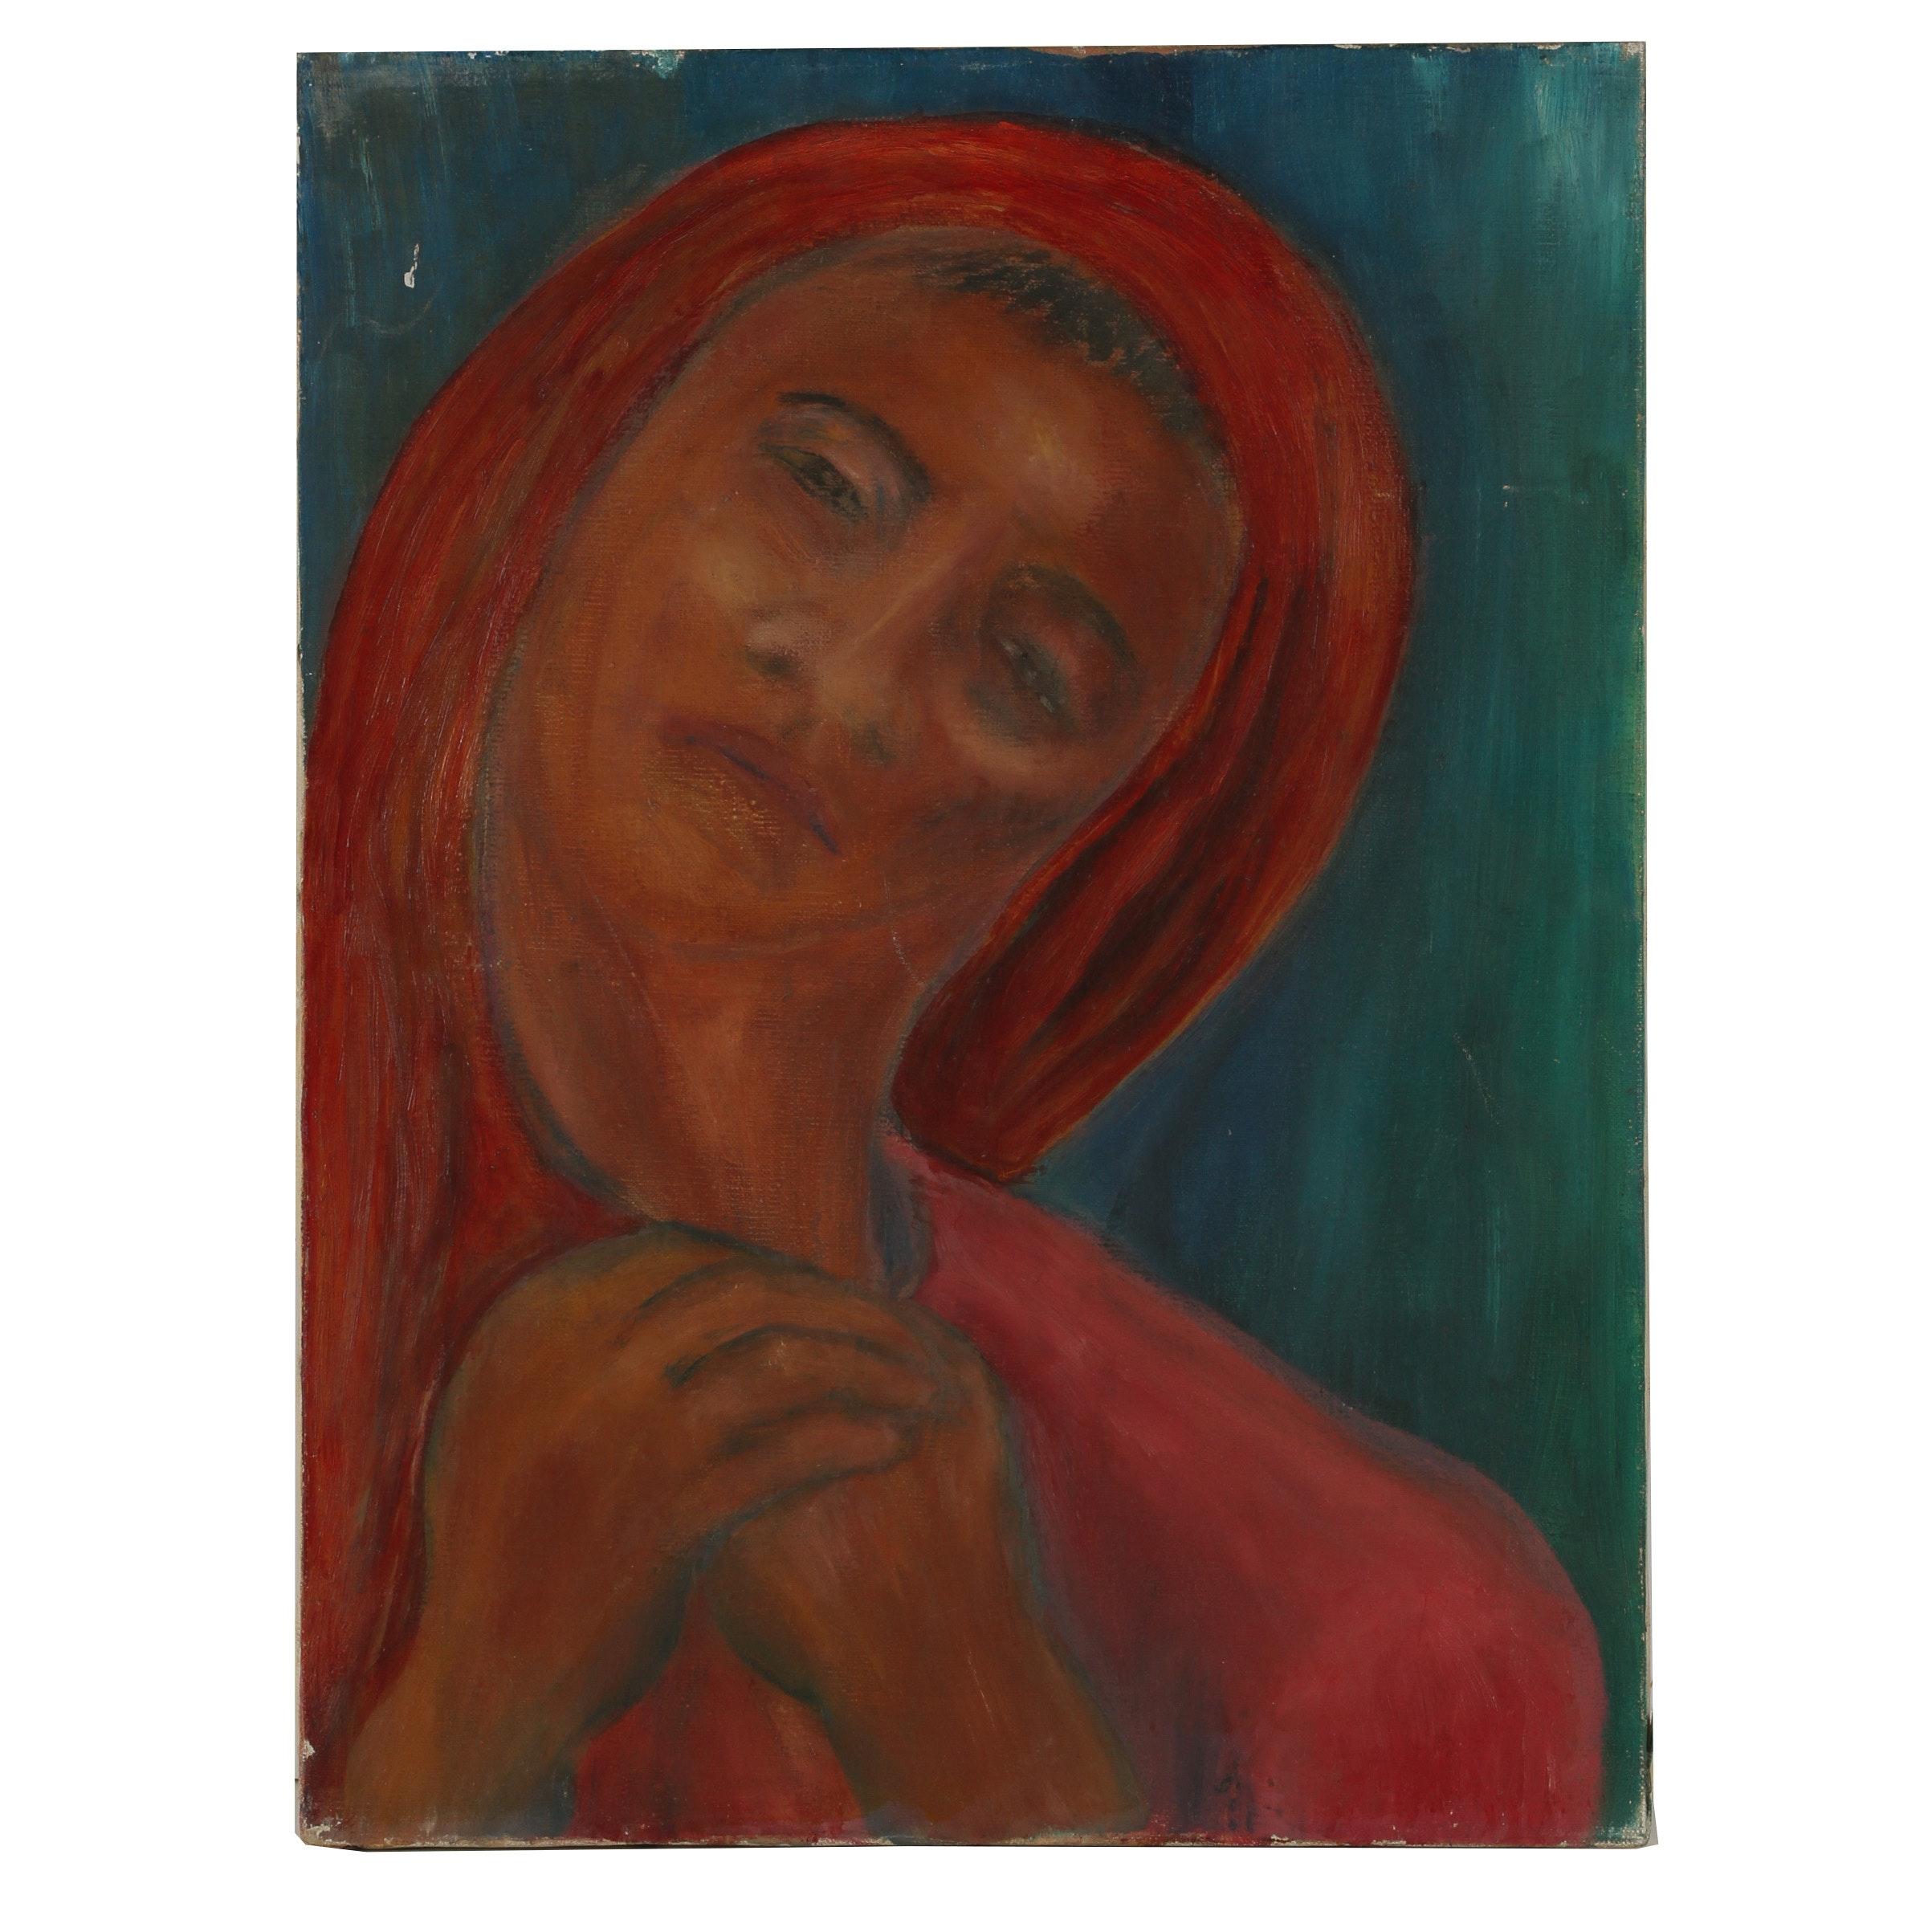 Mid 20th Century Oil Painting